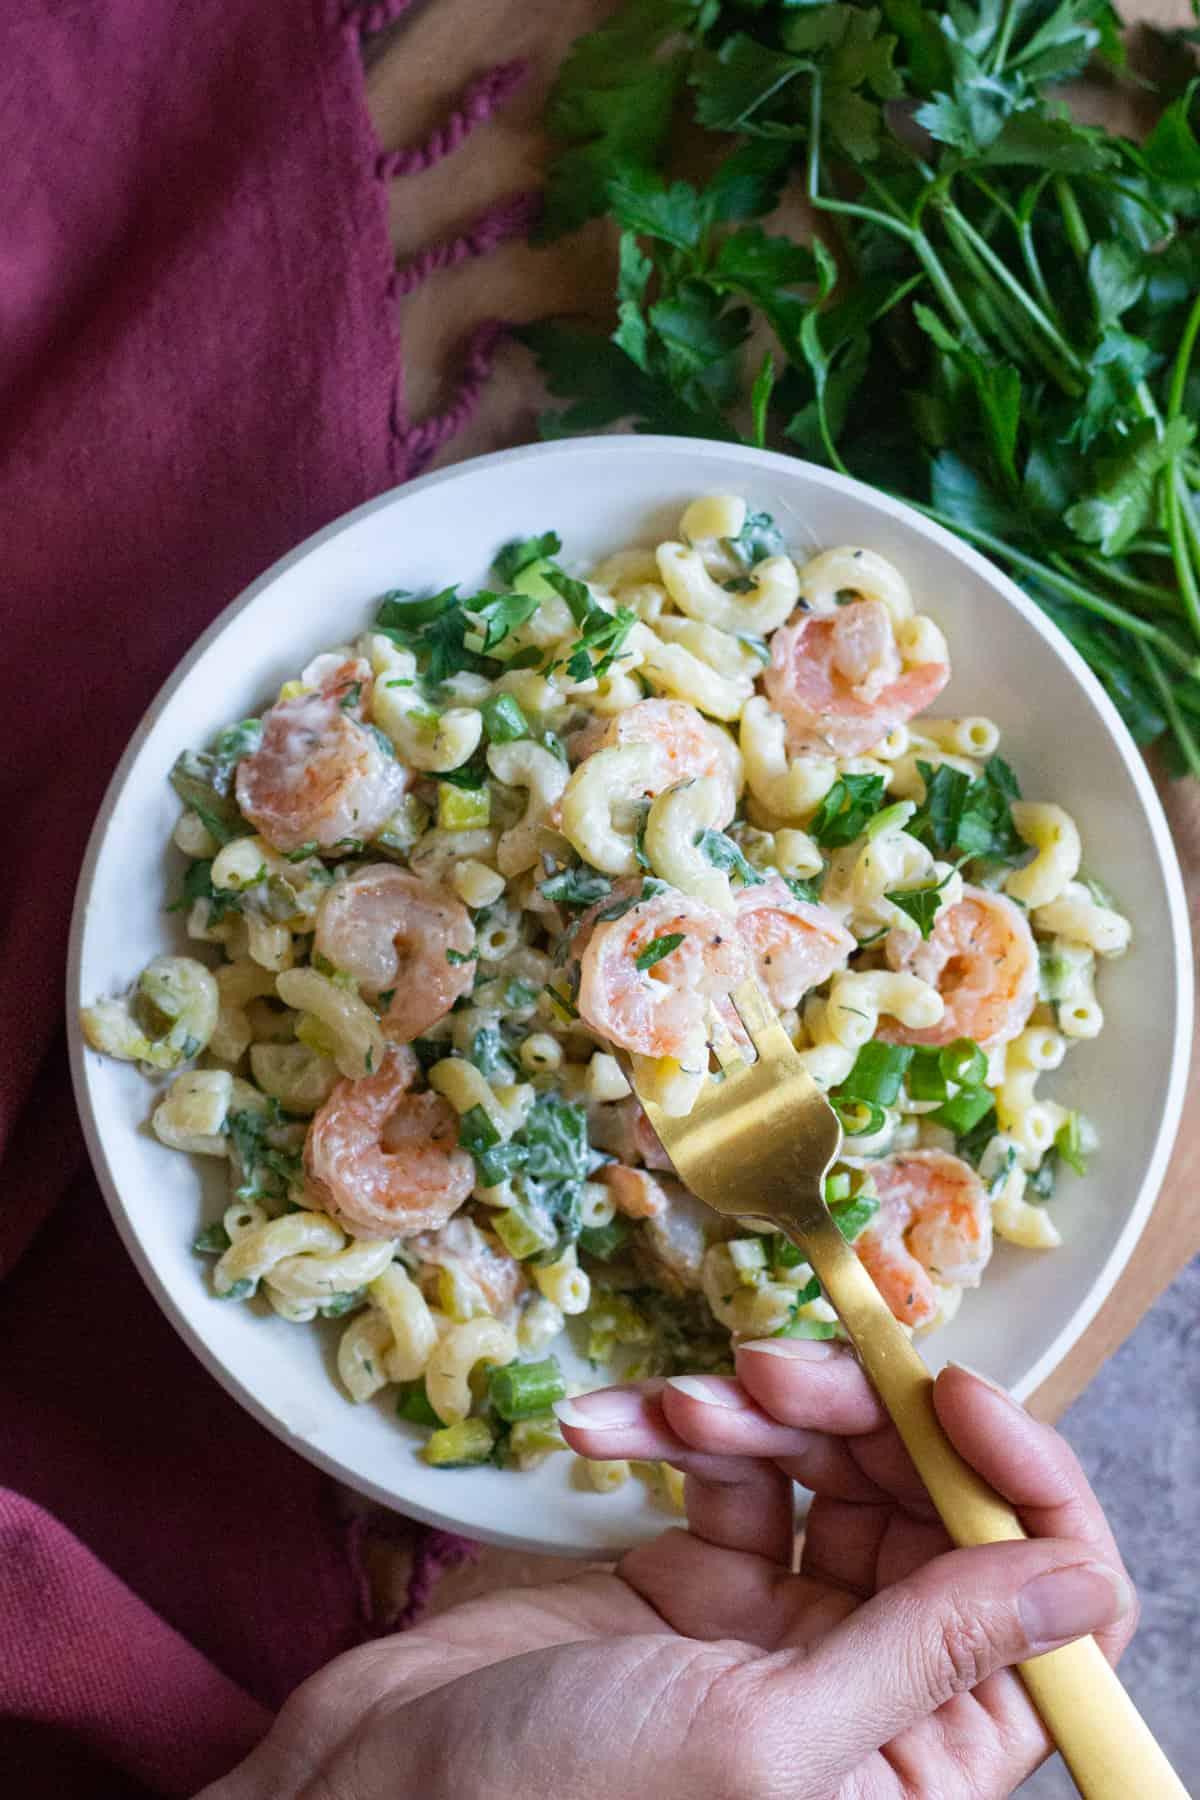 Serve cold shrimp pasta salad after chilling in the fridge for one hour.